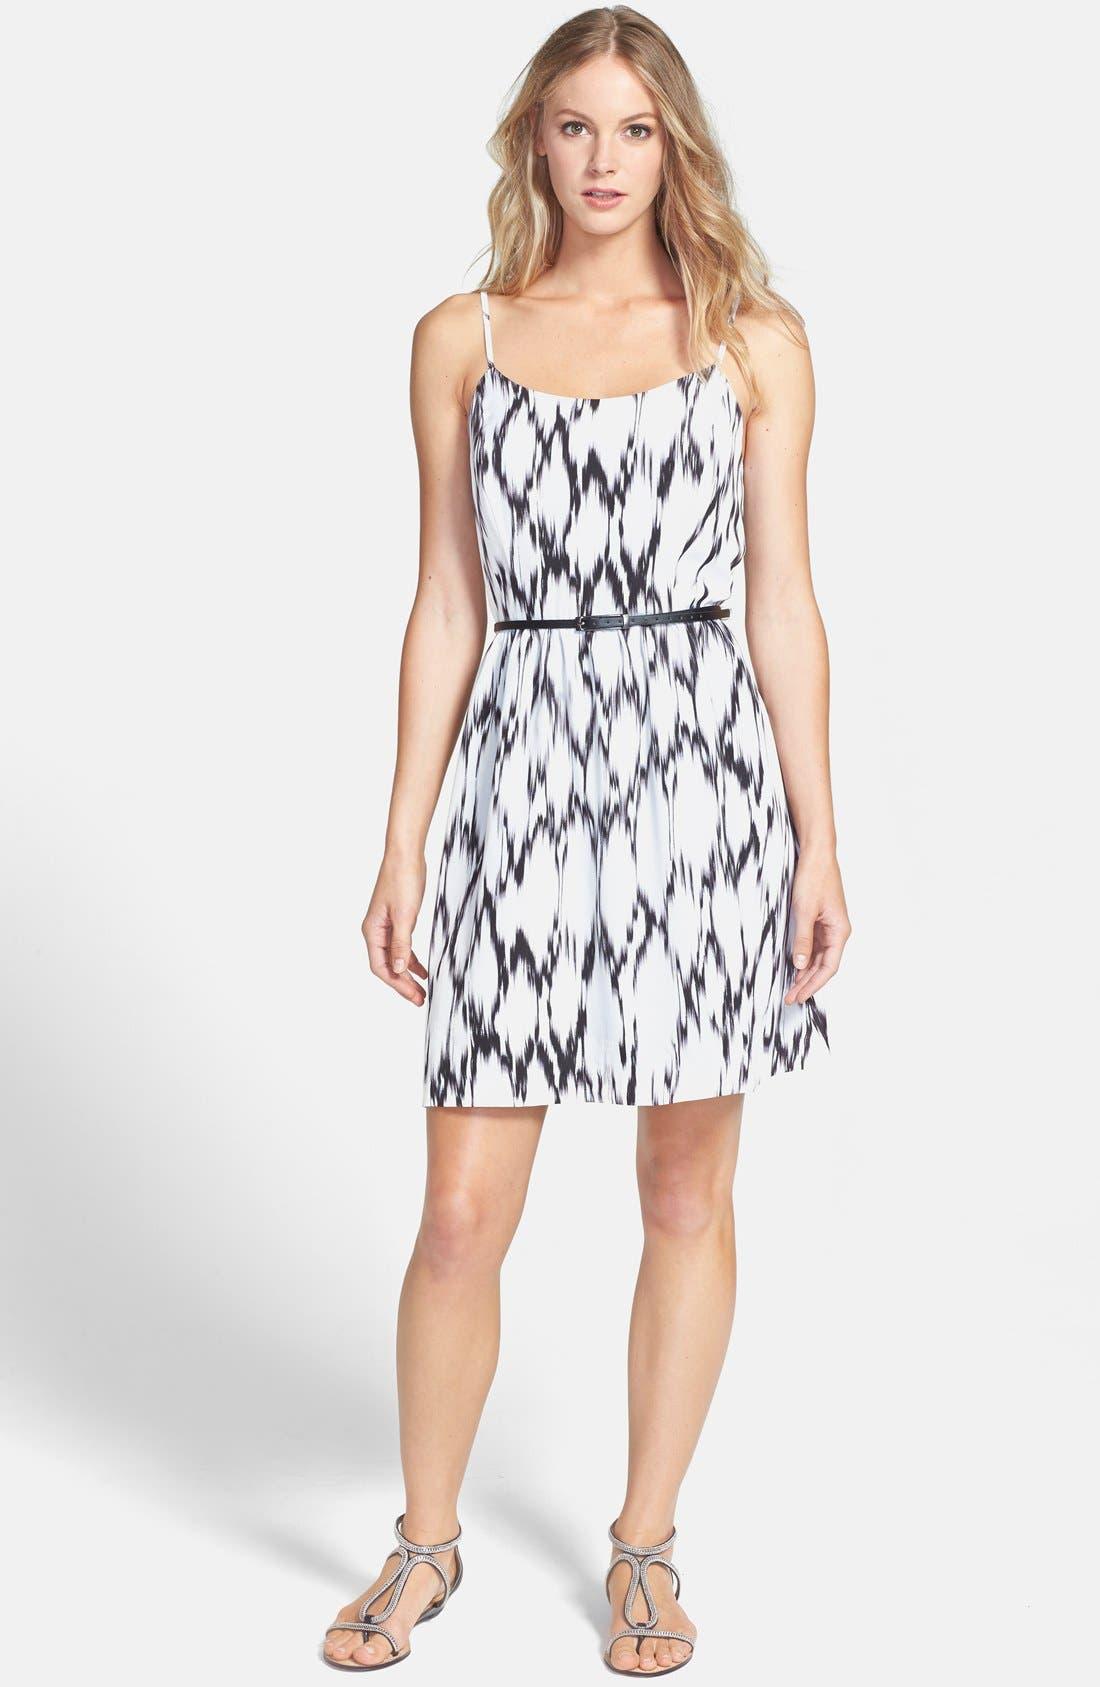 Main Image - kensie 'Streaked Spots' Fit & Flare Dress